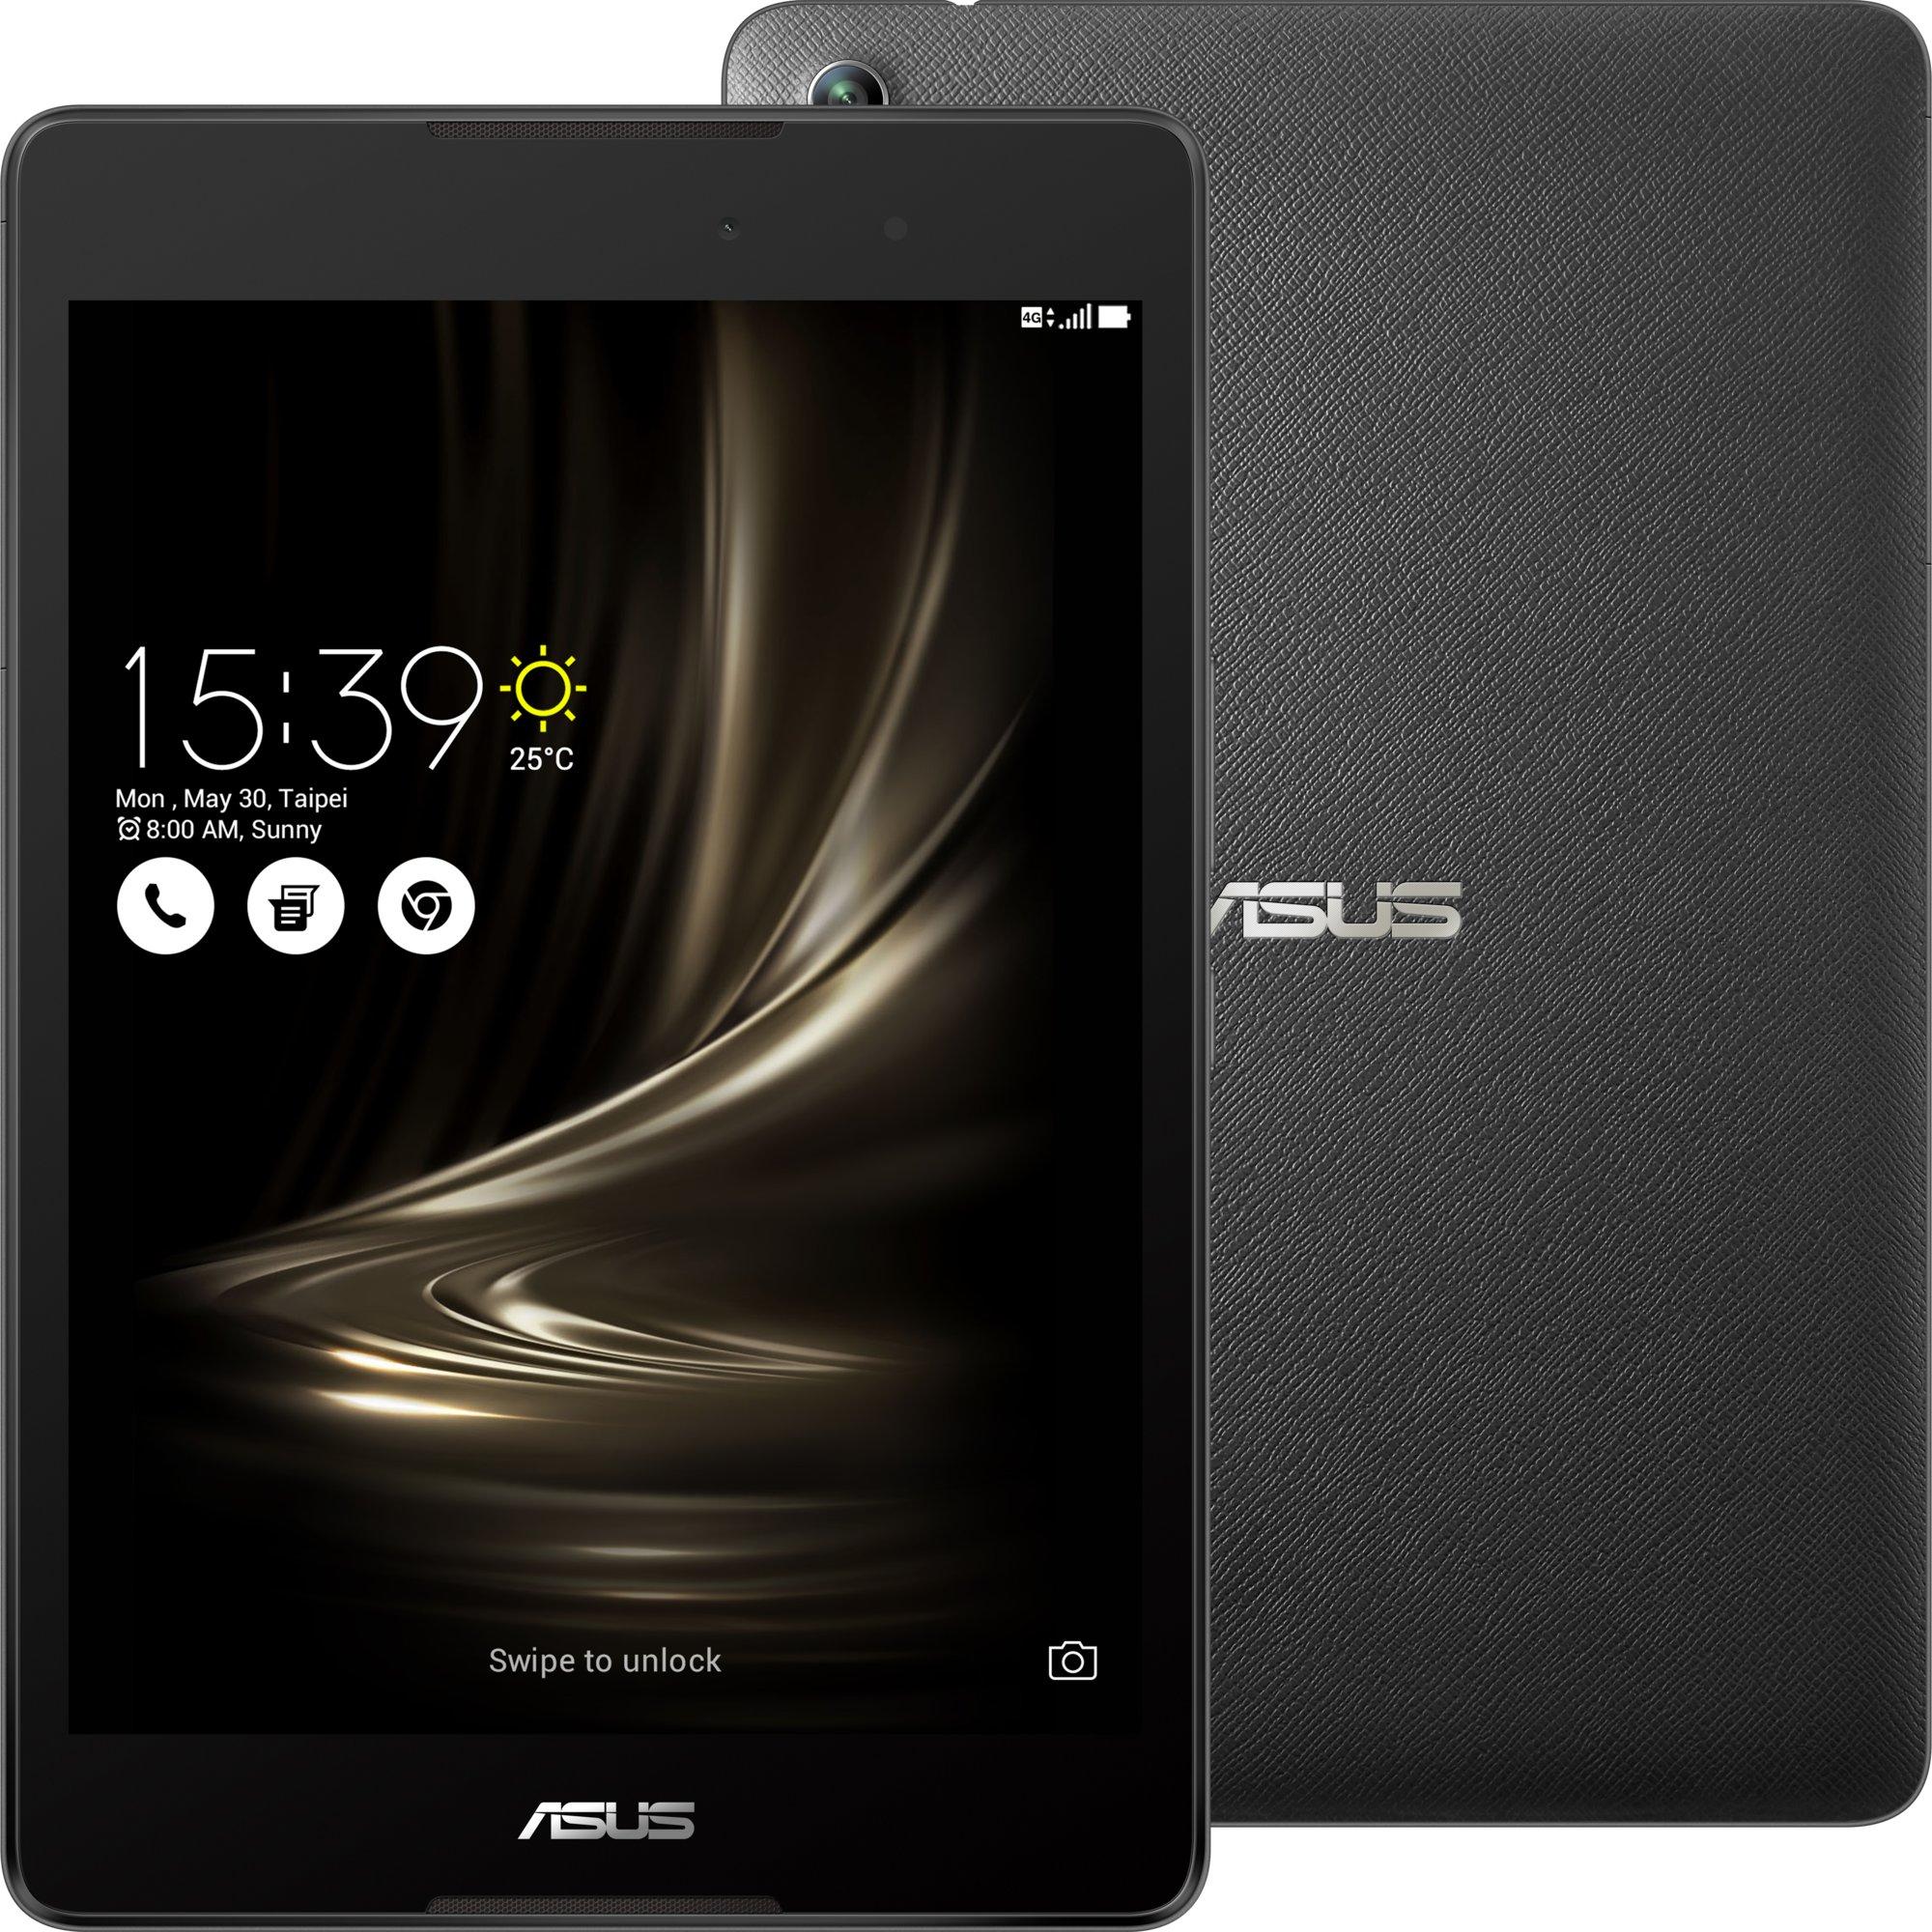 "Asus ZenPad 3 8.0 MSM8956/2GB/16GB/LTE/8""/2048x1536/IPS/Andorid 6.0/black"